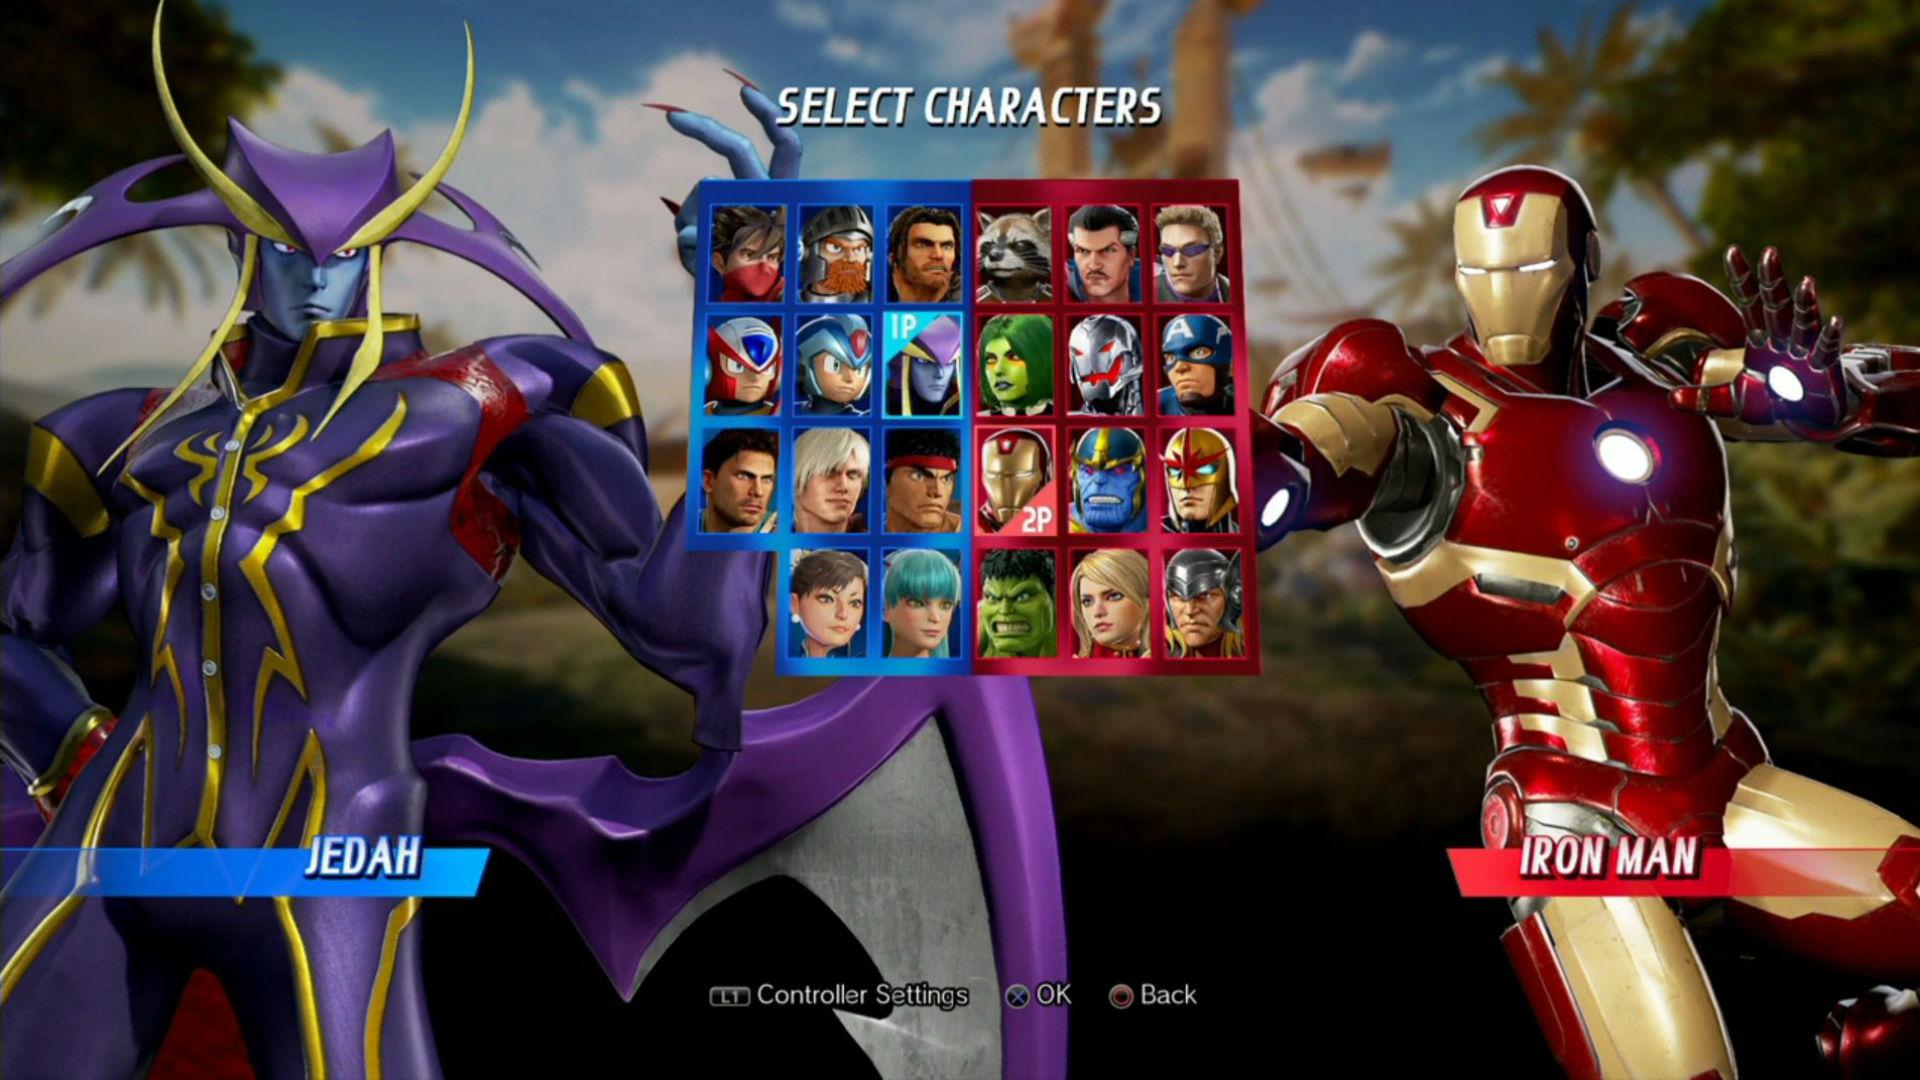 Darkstalkers' Jedah confirmed for Marvel vs. Capcom: Infinite screenshot